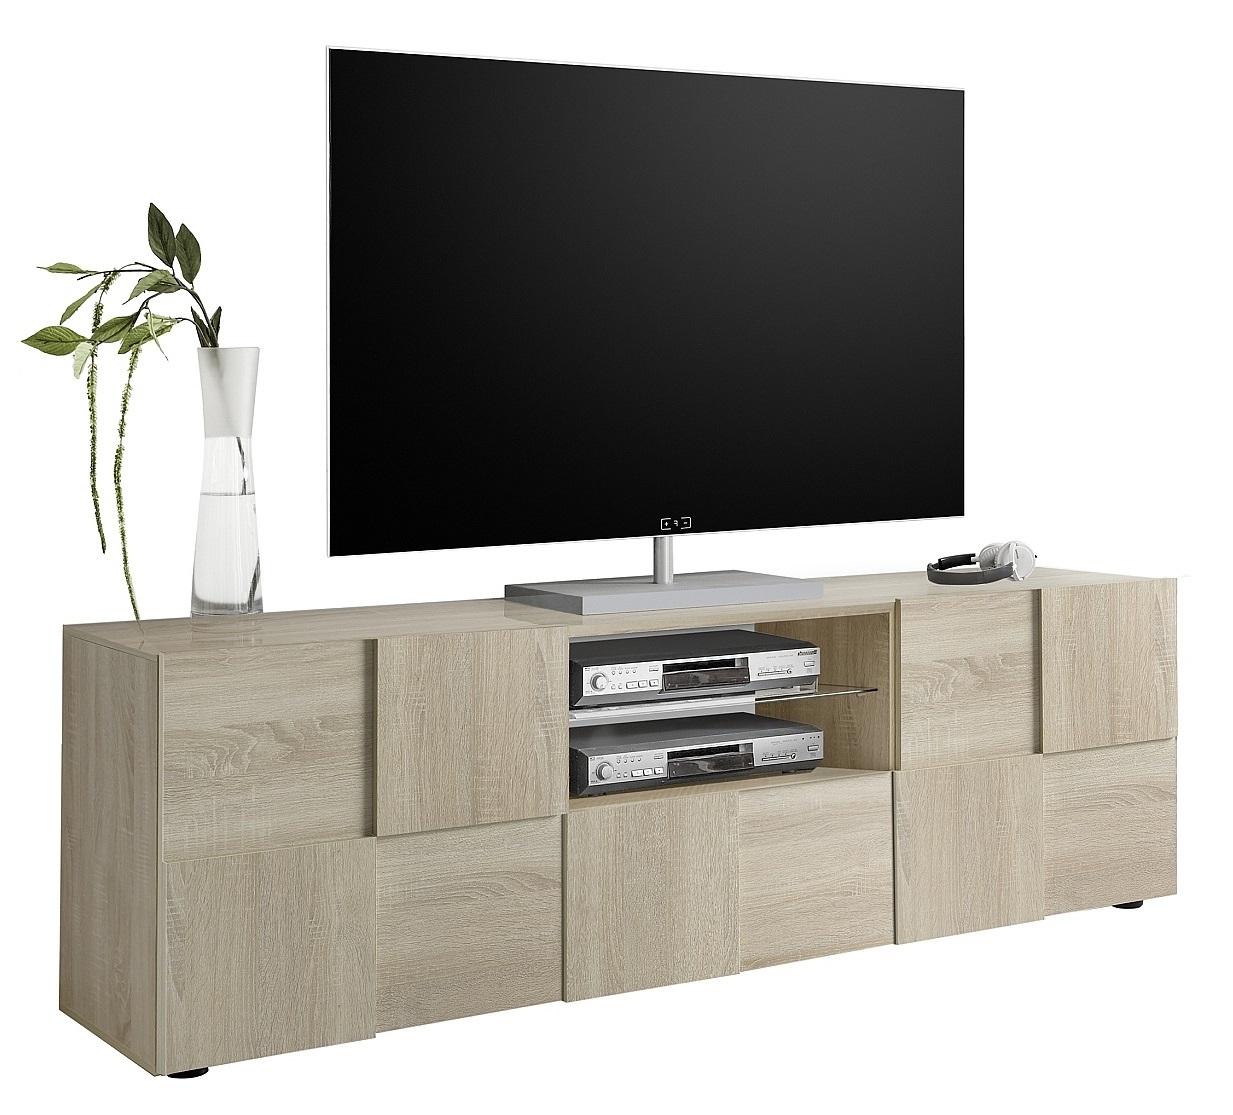 Tv-meubel Dama 181 cm breed in sonoma eiken